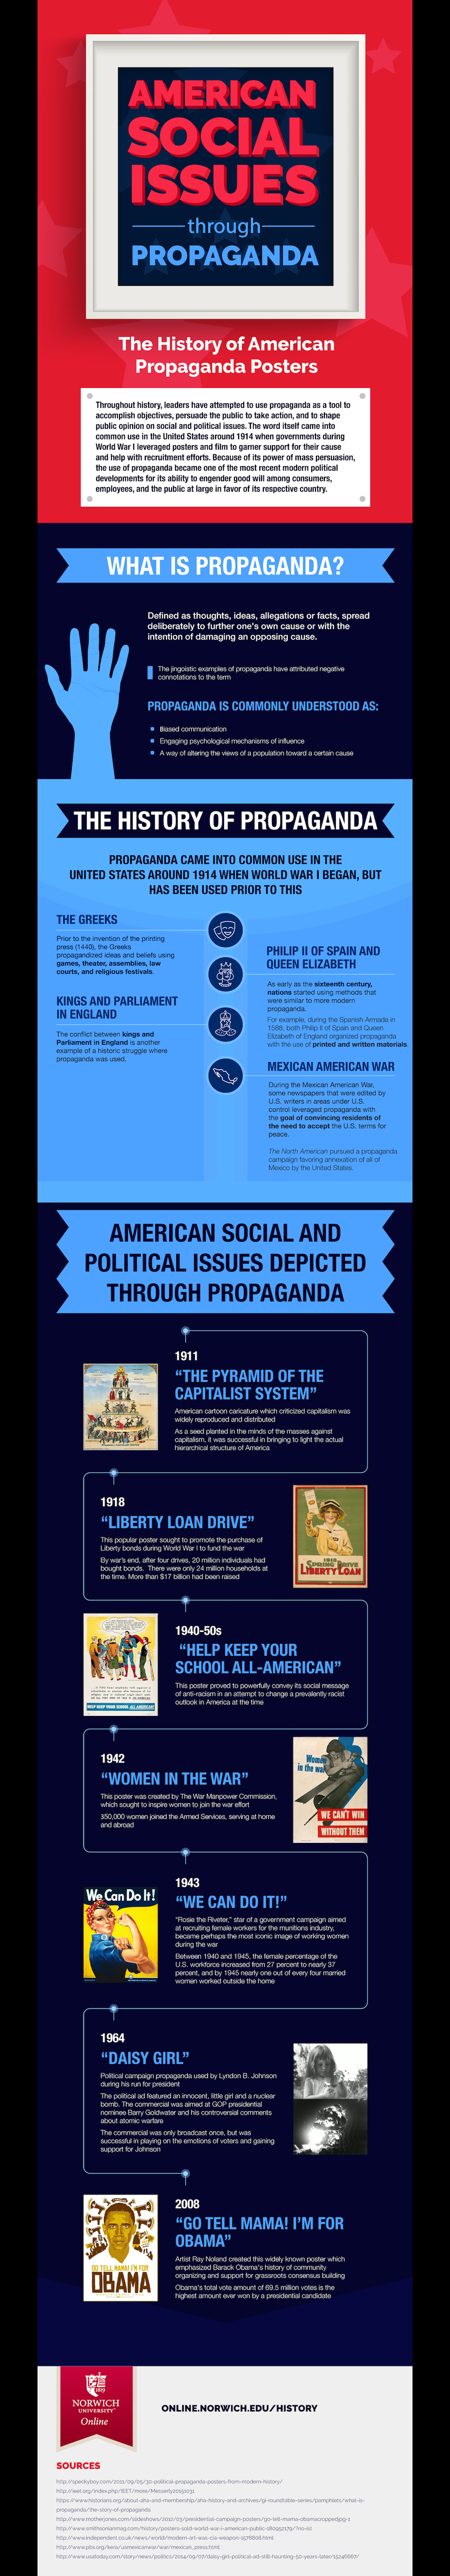 history of propaganda infographic image